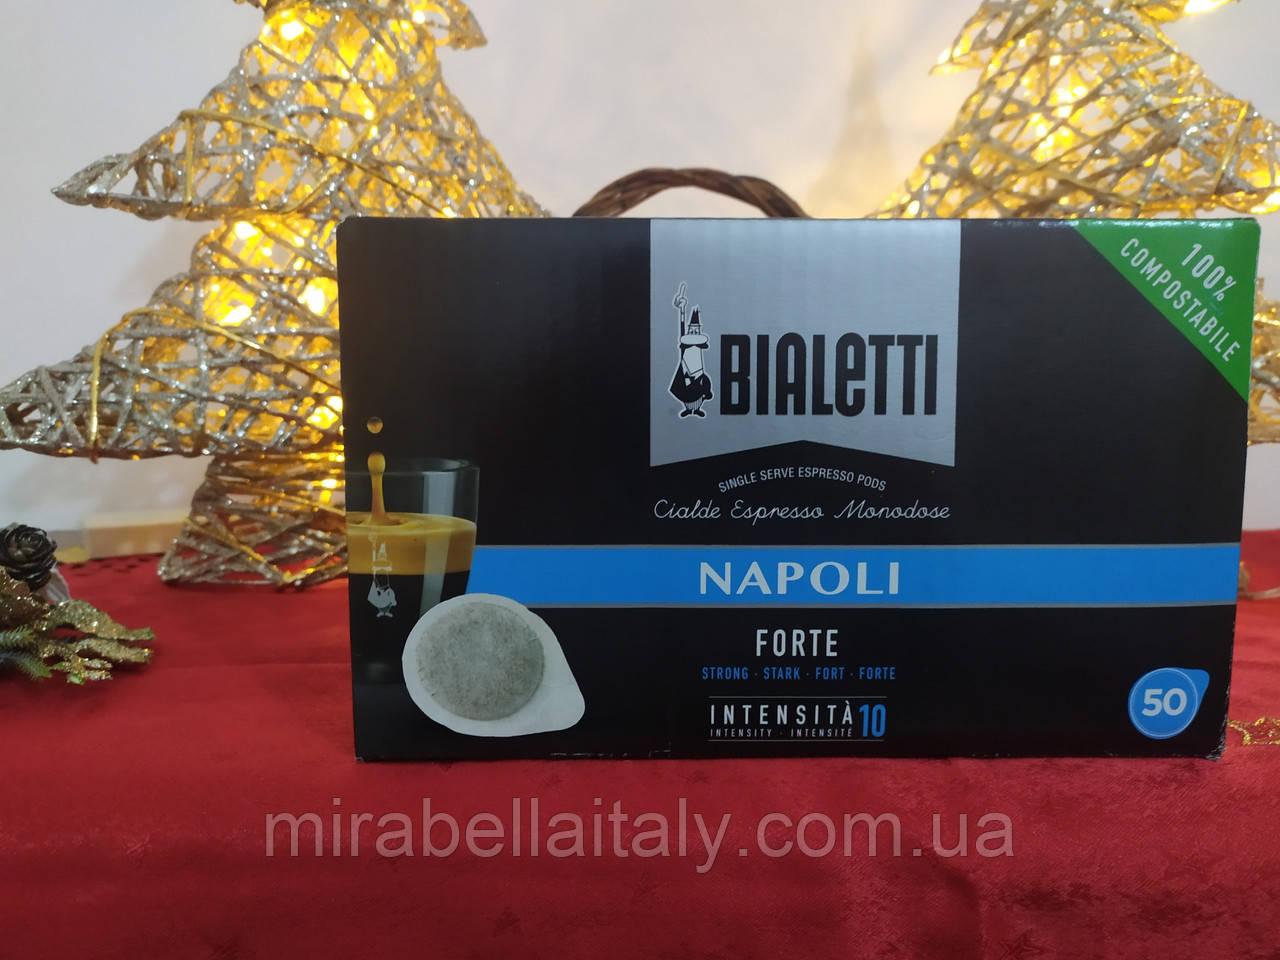 Биалетти таблетки(капсулы) 50 шт